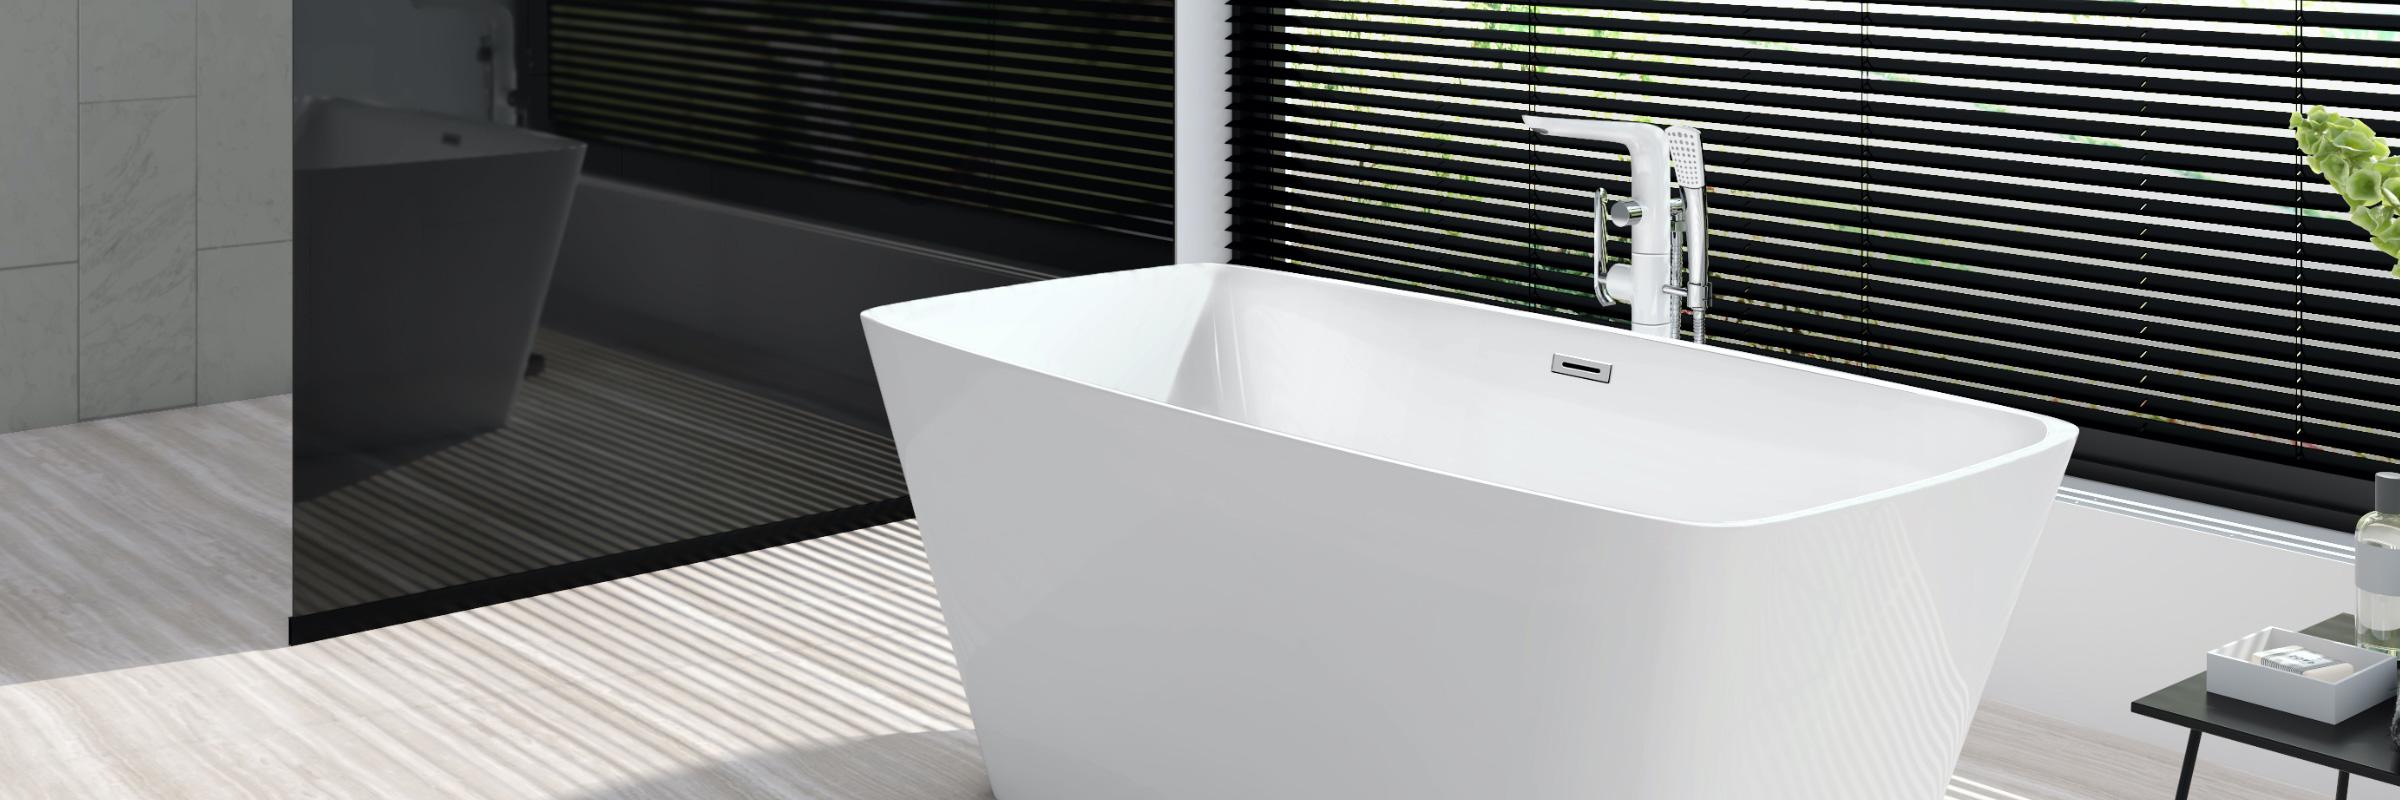 Freestanding Frederick York tub